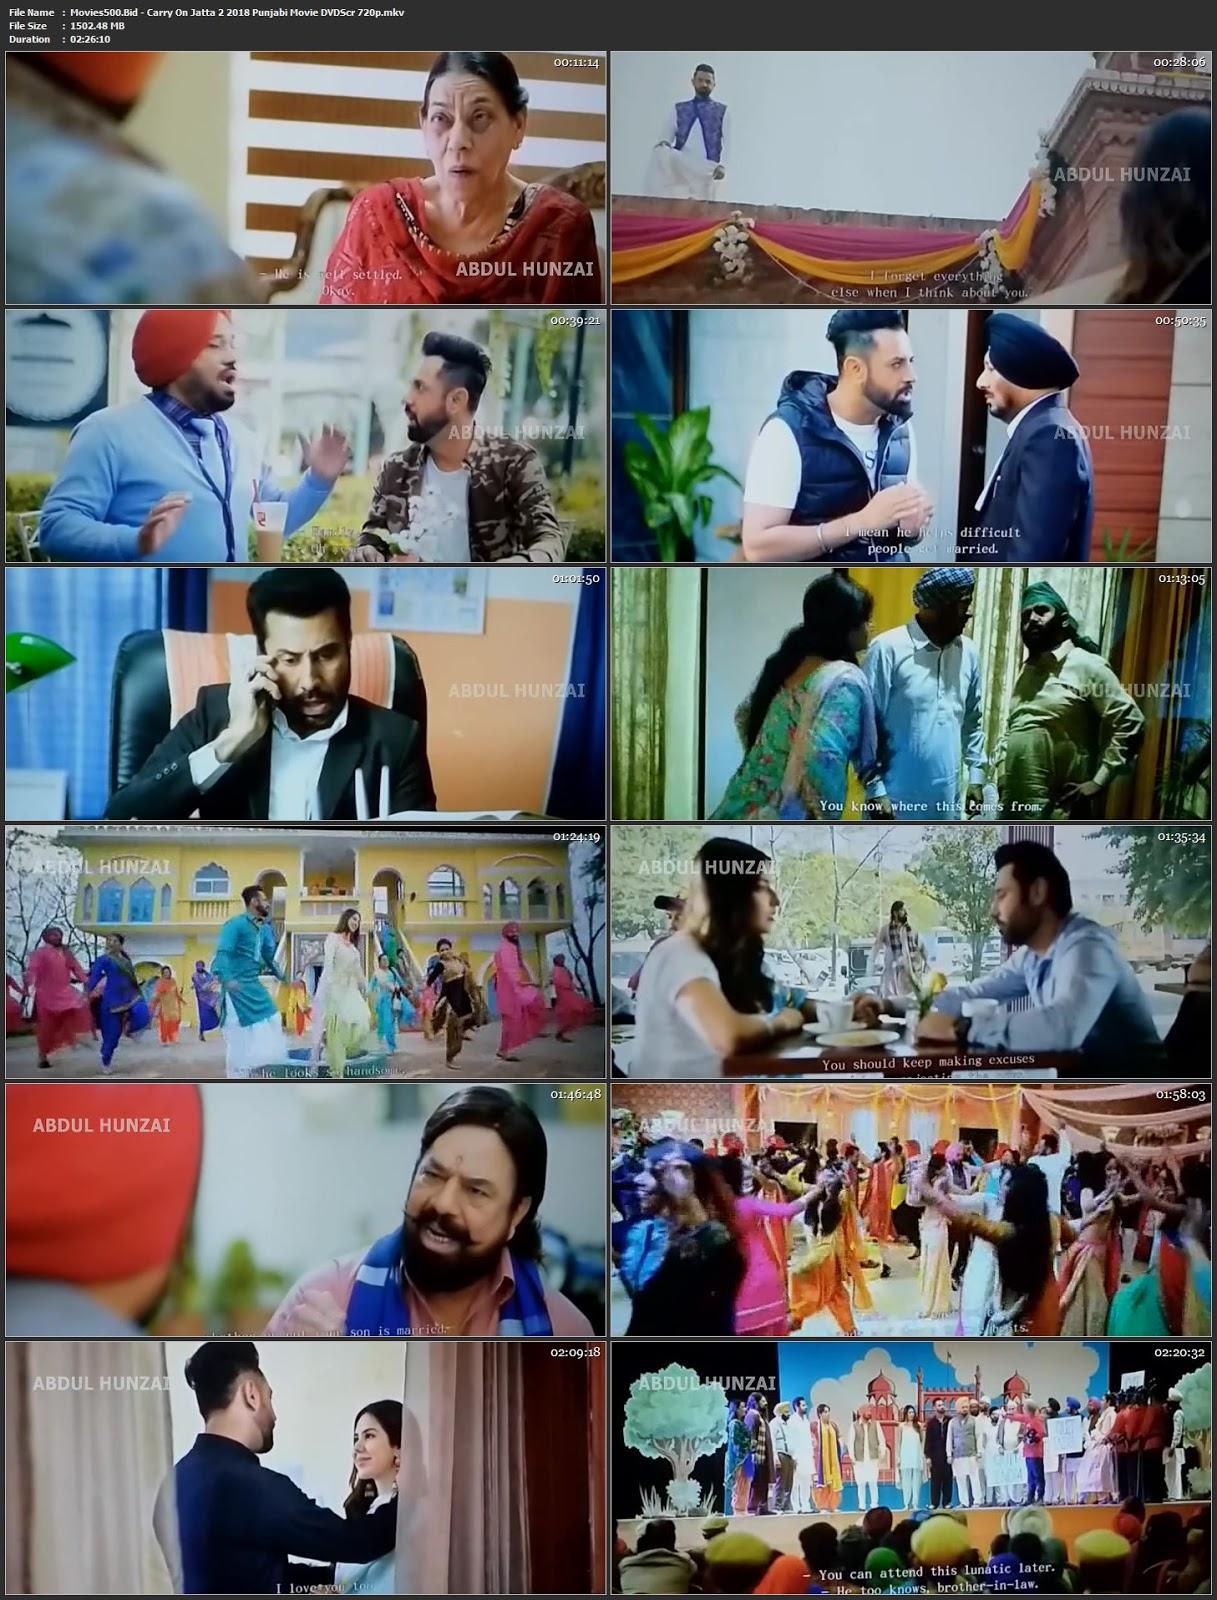 Carry on Jatta 2 2018 Punjabi full Movie DVDScr 720p 1.5GB